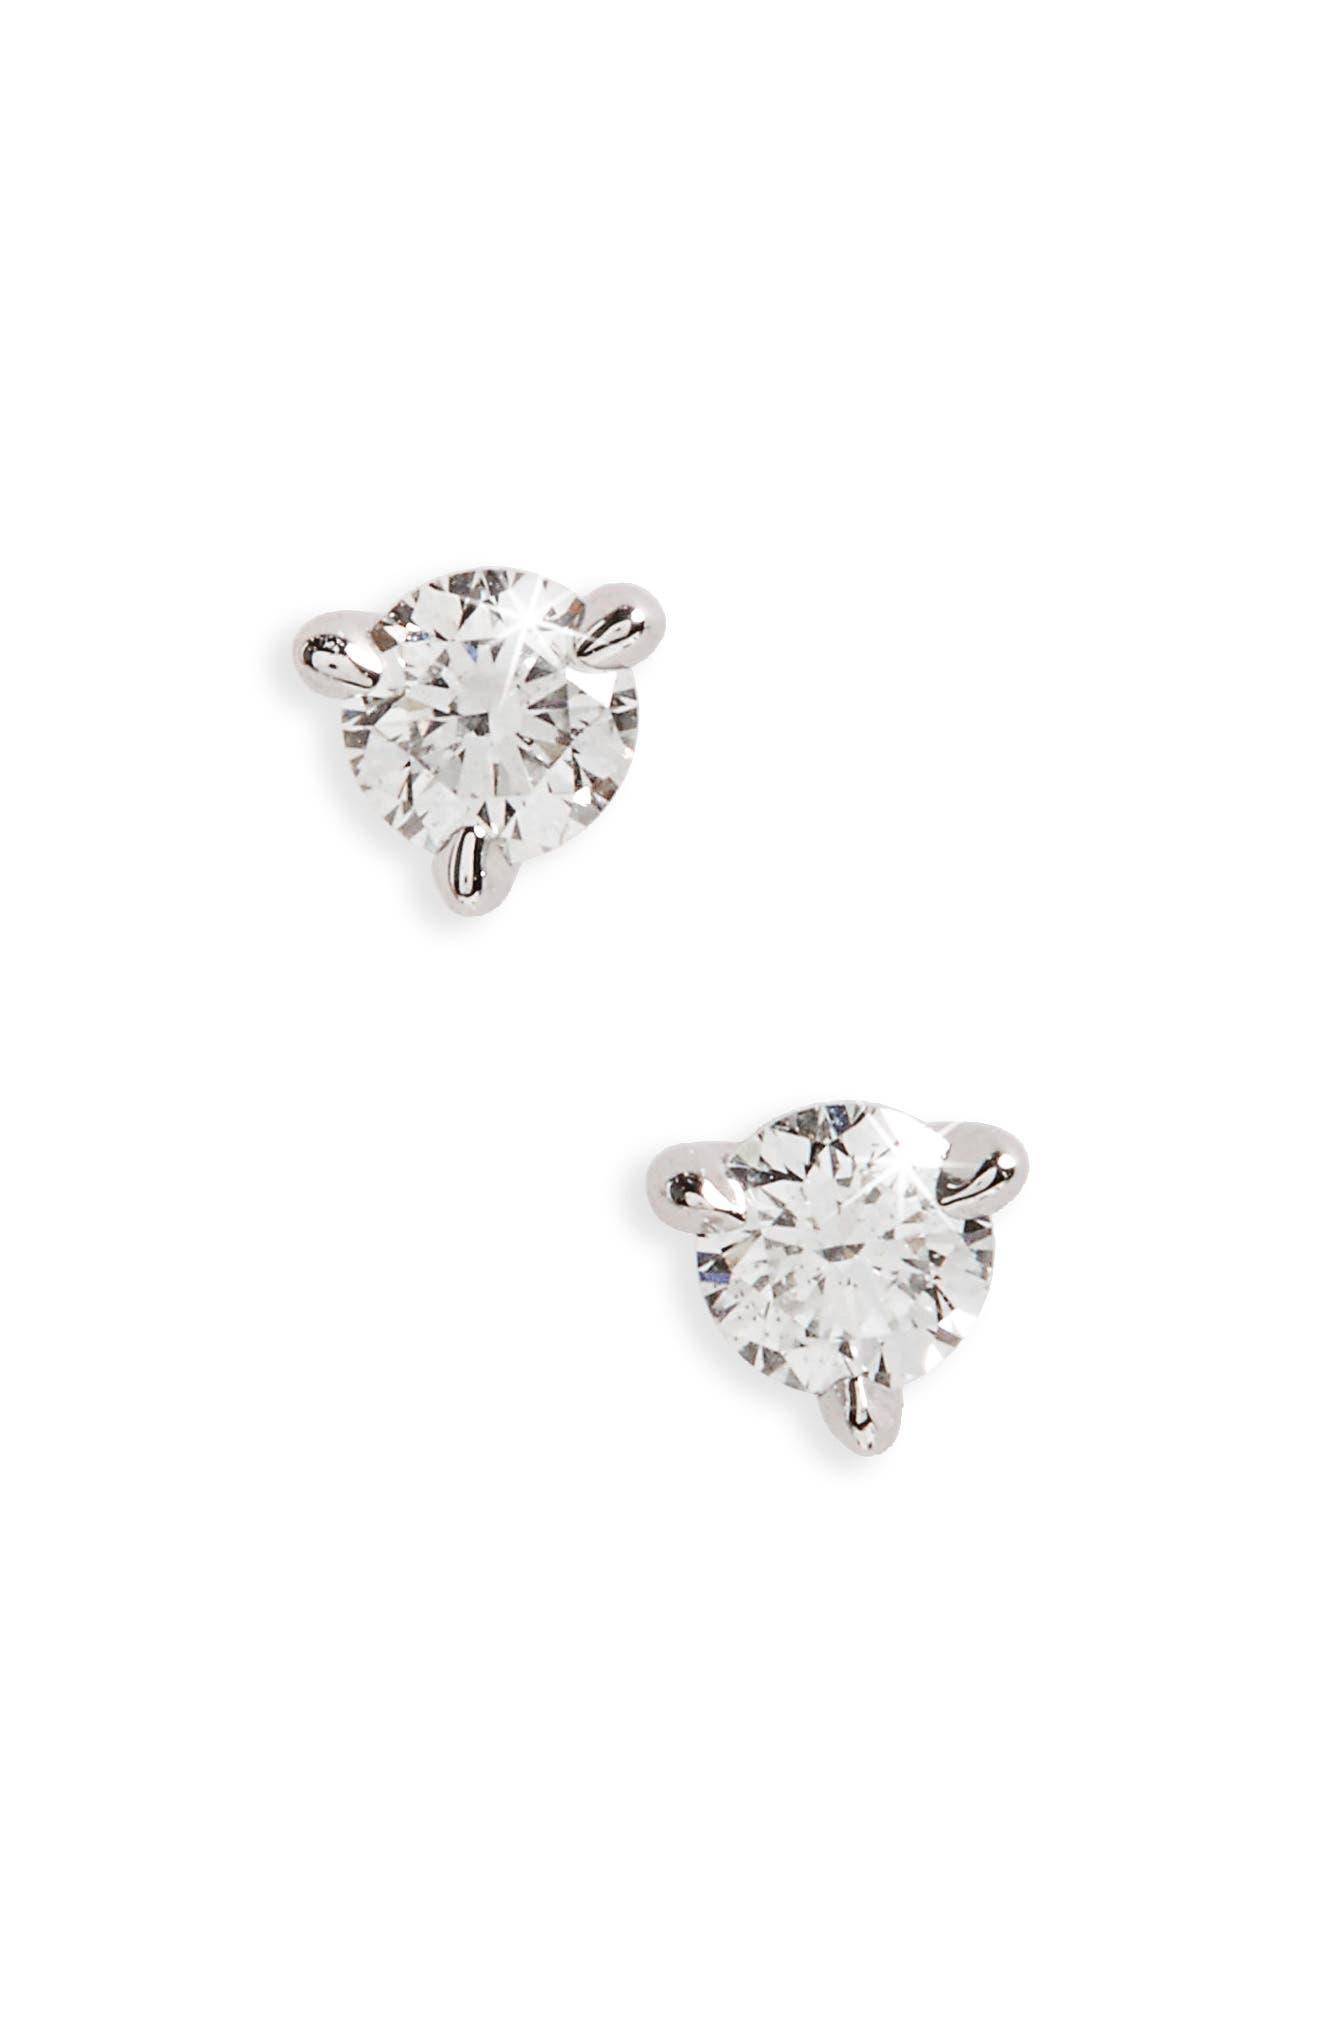 0.25ct tw Diamond & Platinum Stud Earrings,                         Main,                         color, Platinum